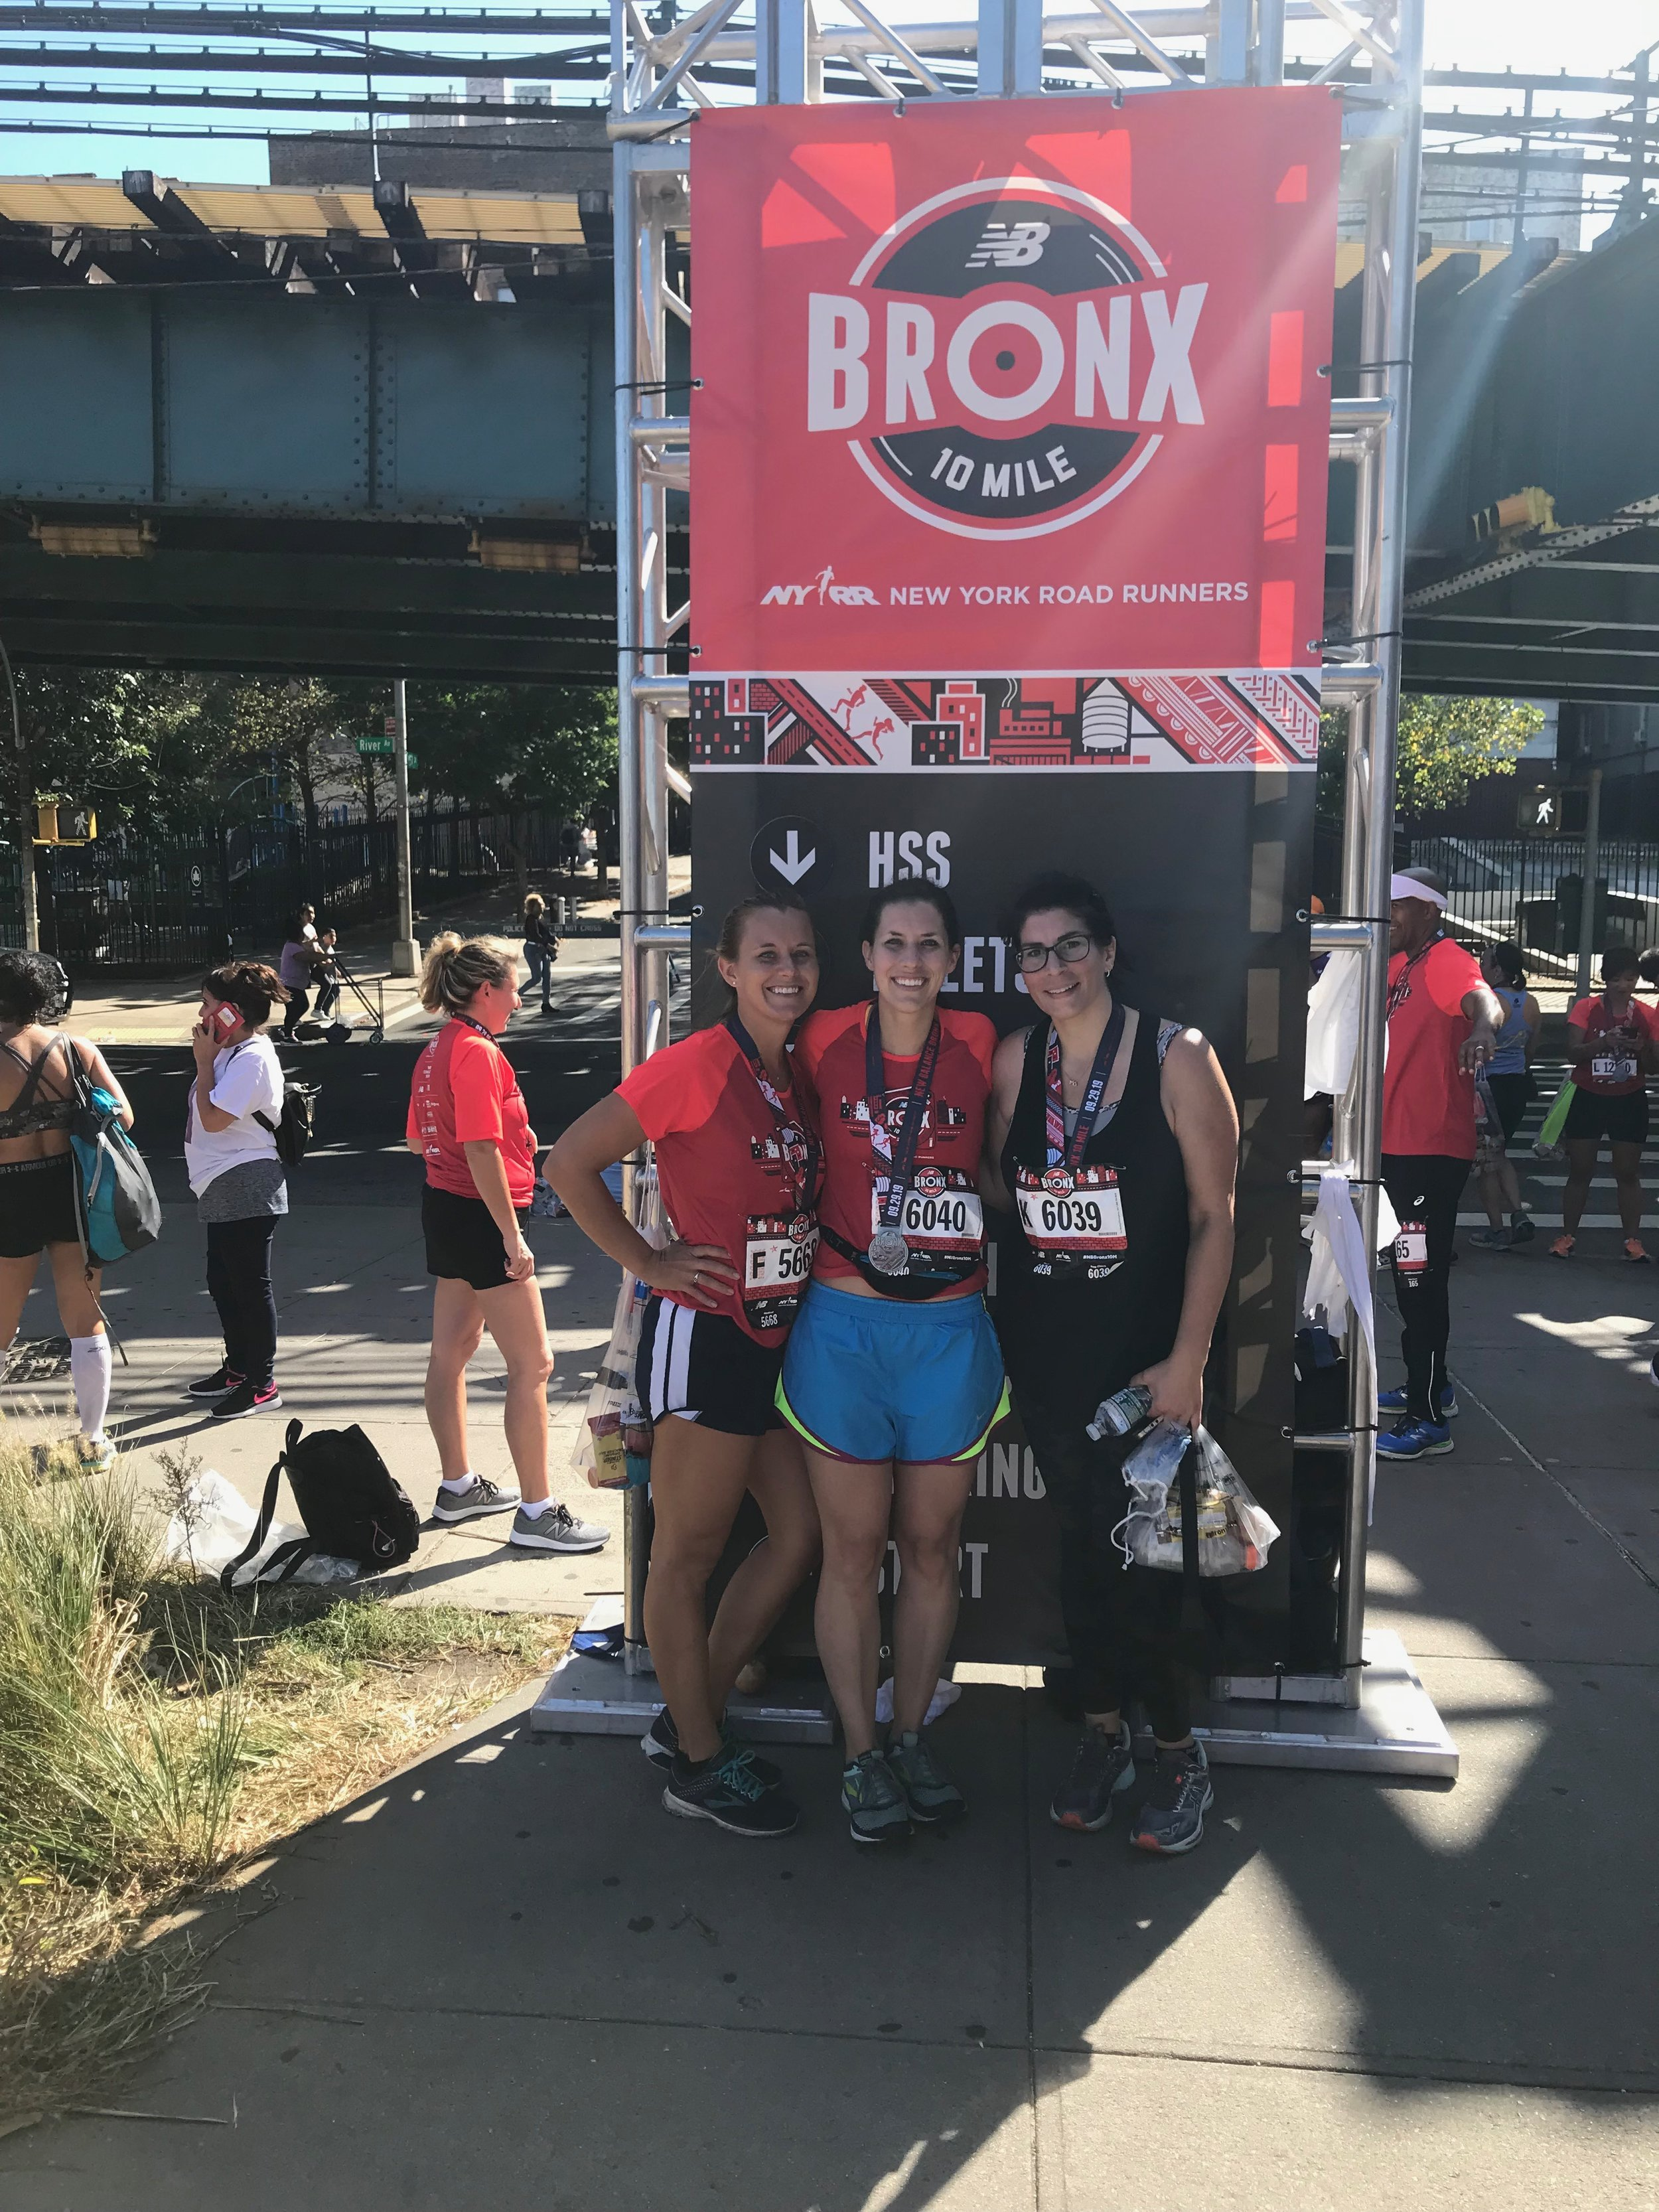 NB Bronx 10 miler